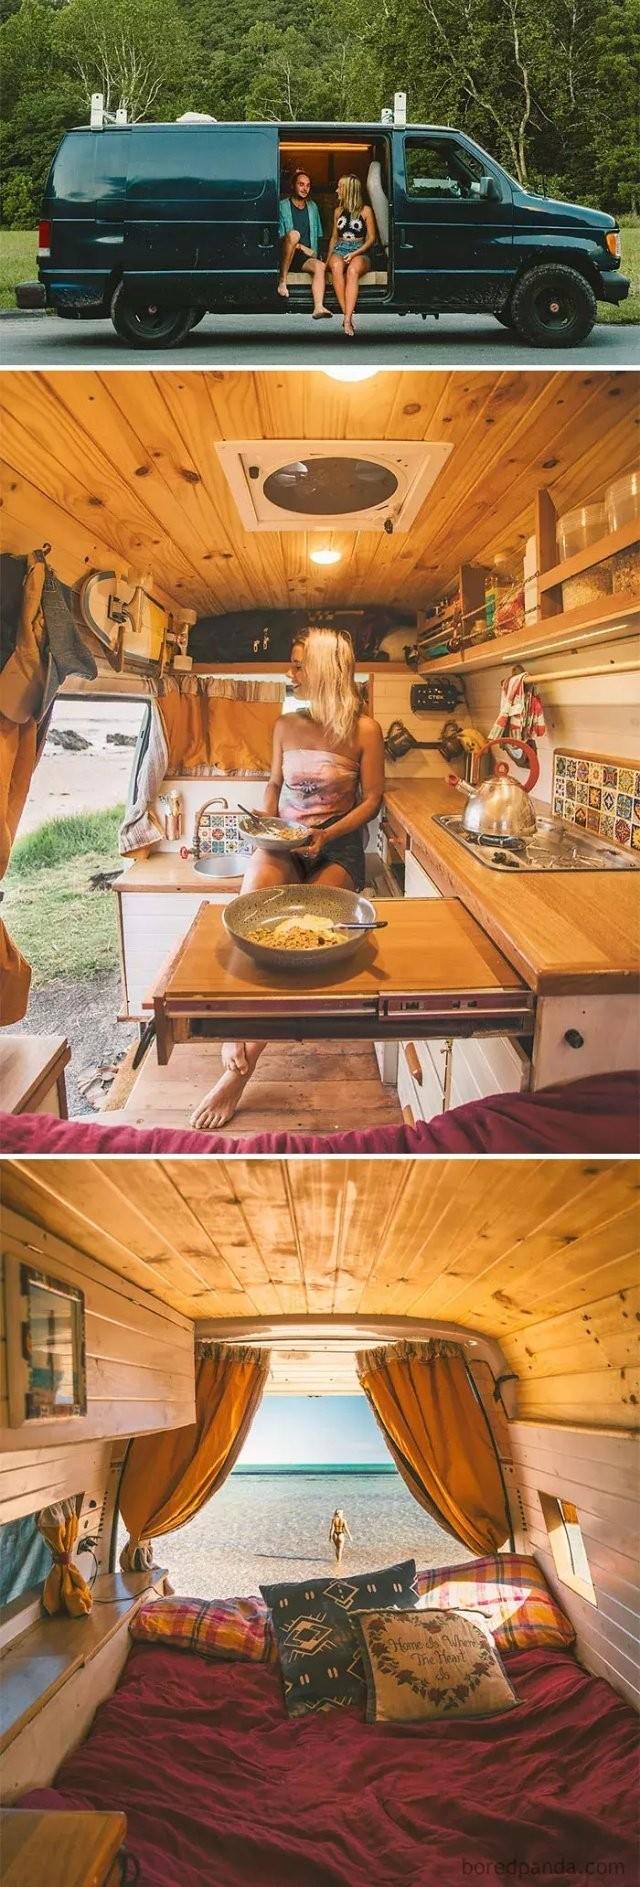 Дома на колесах для путешествий (20 фото)